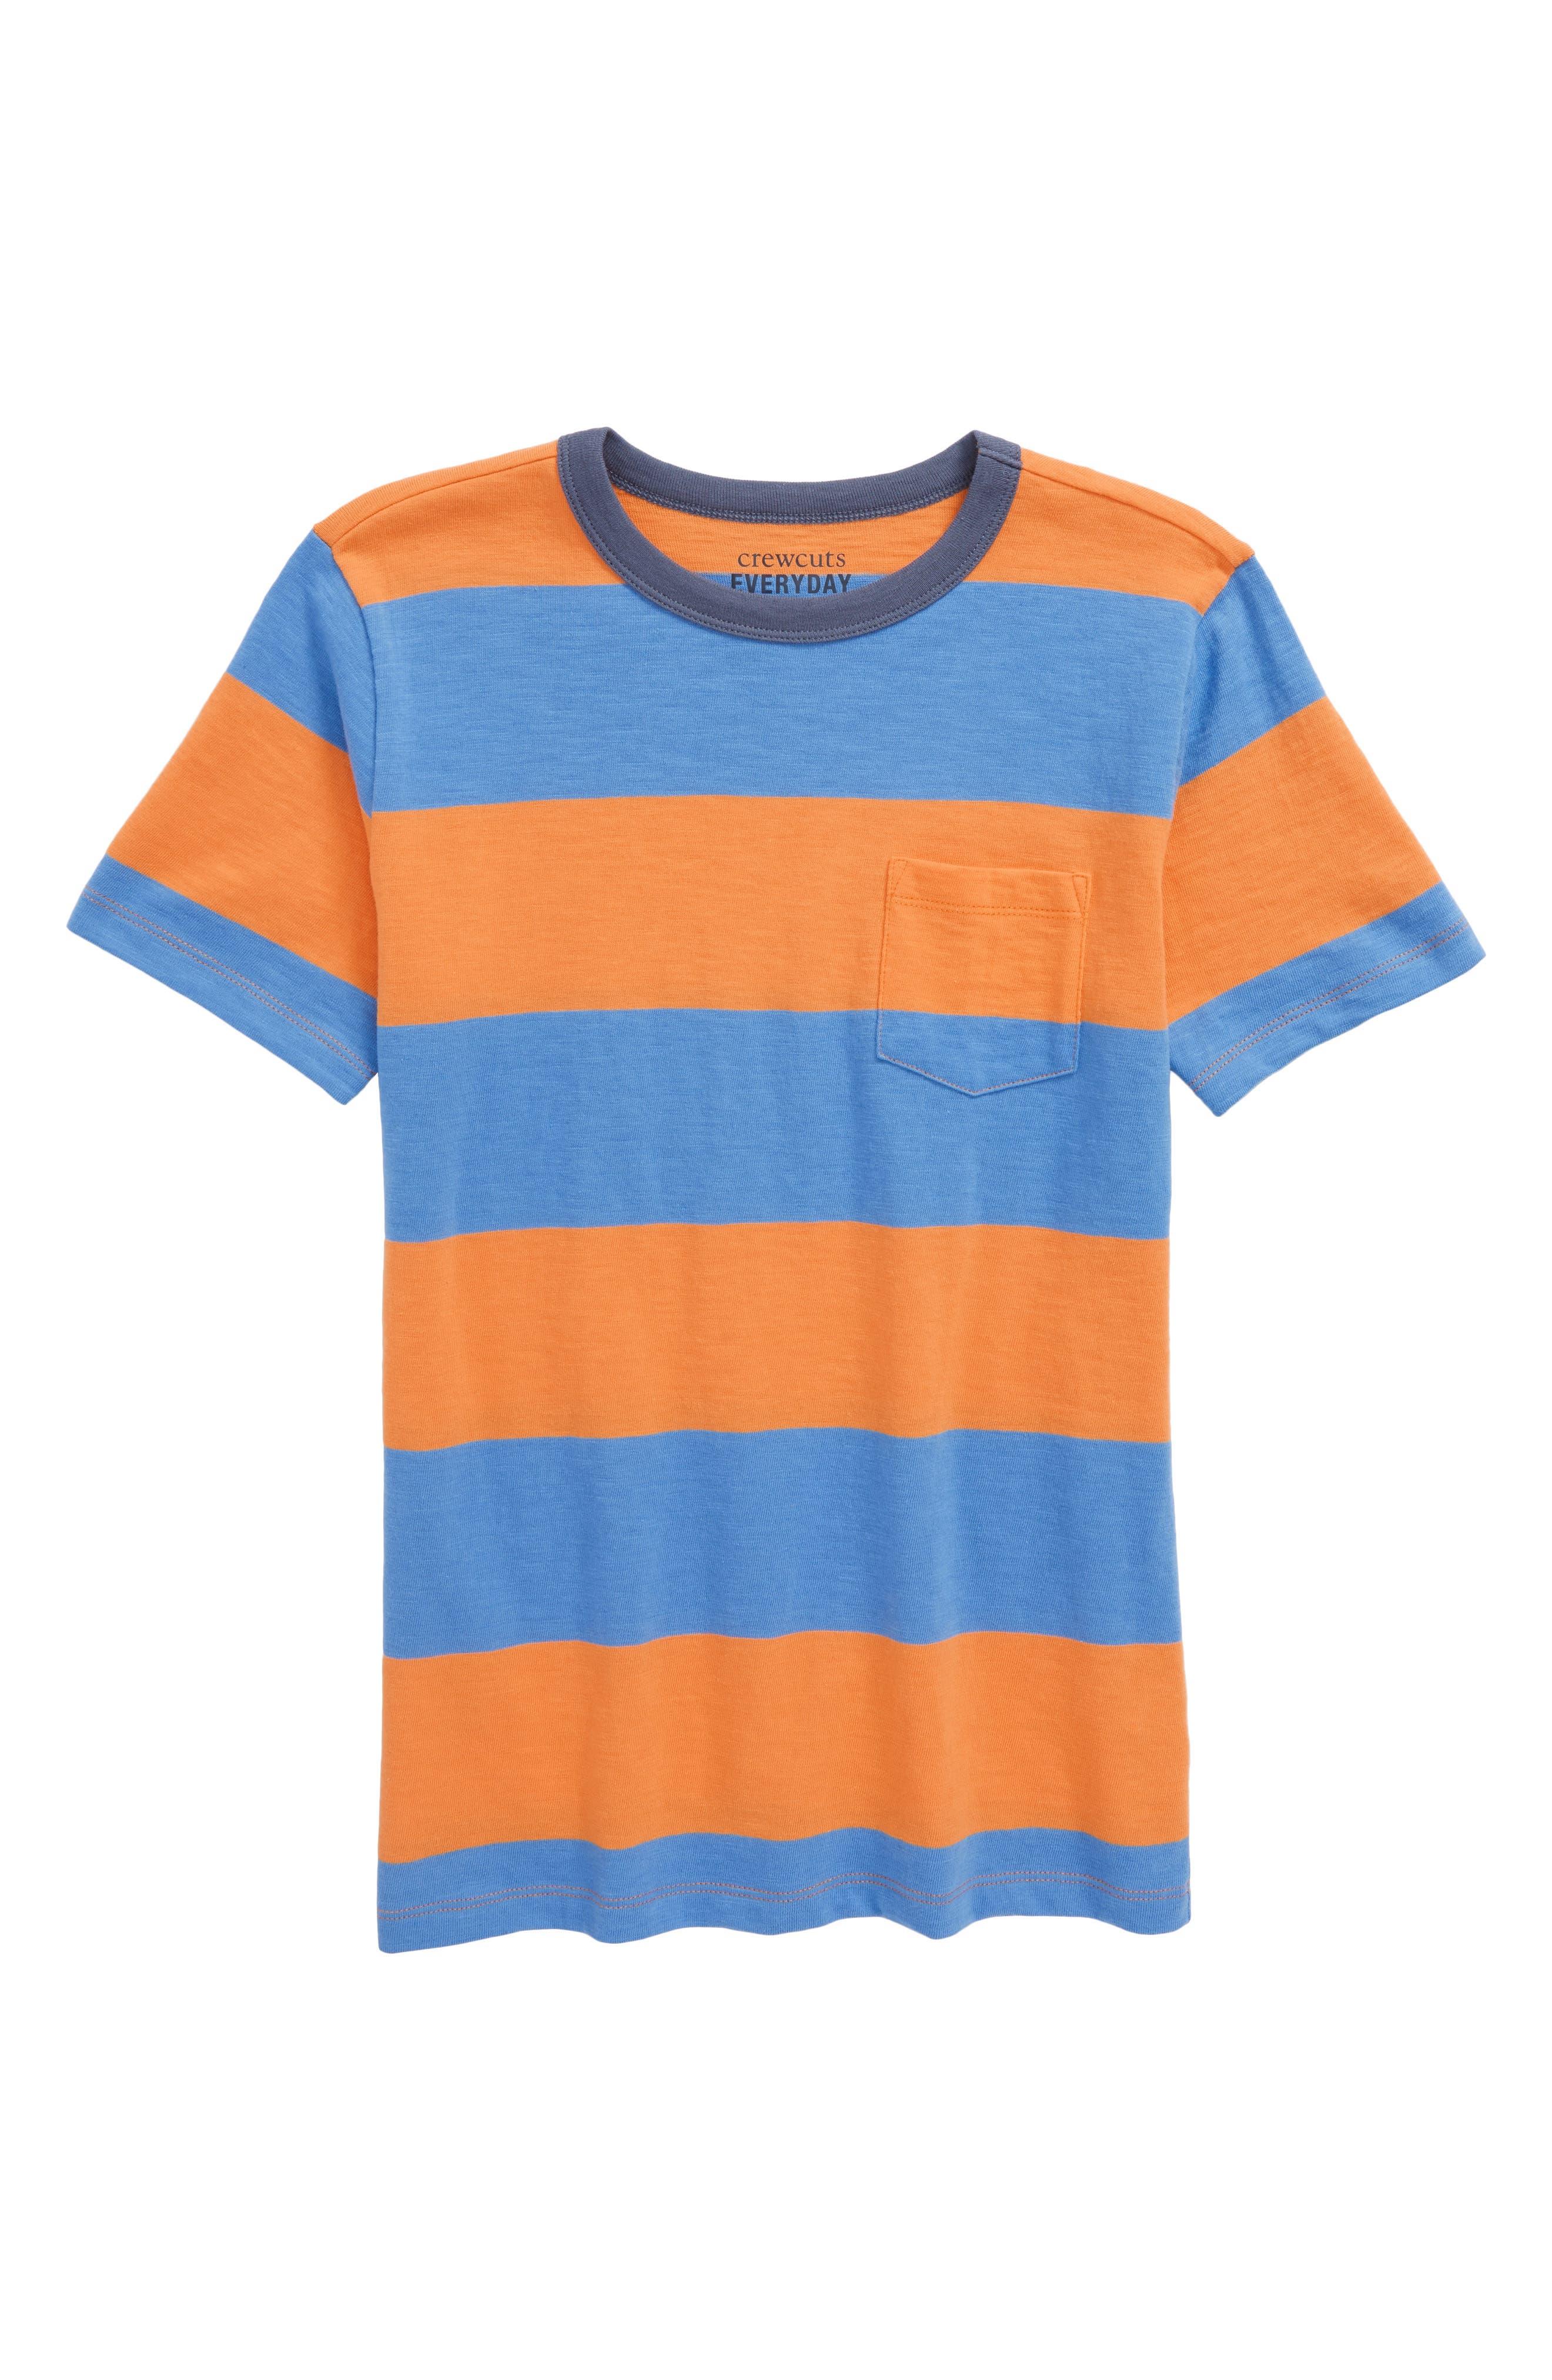 crewcuts by J.Crew Double Rugby Stripe Shirt (Toddler Boys, Little Boys & Big Boys)